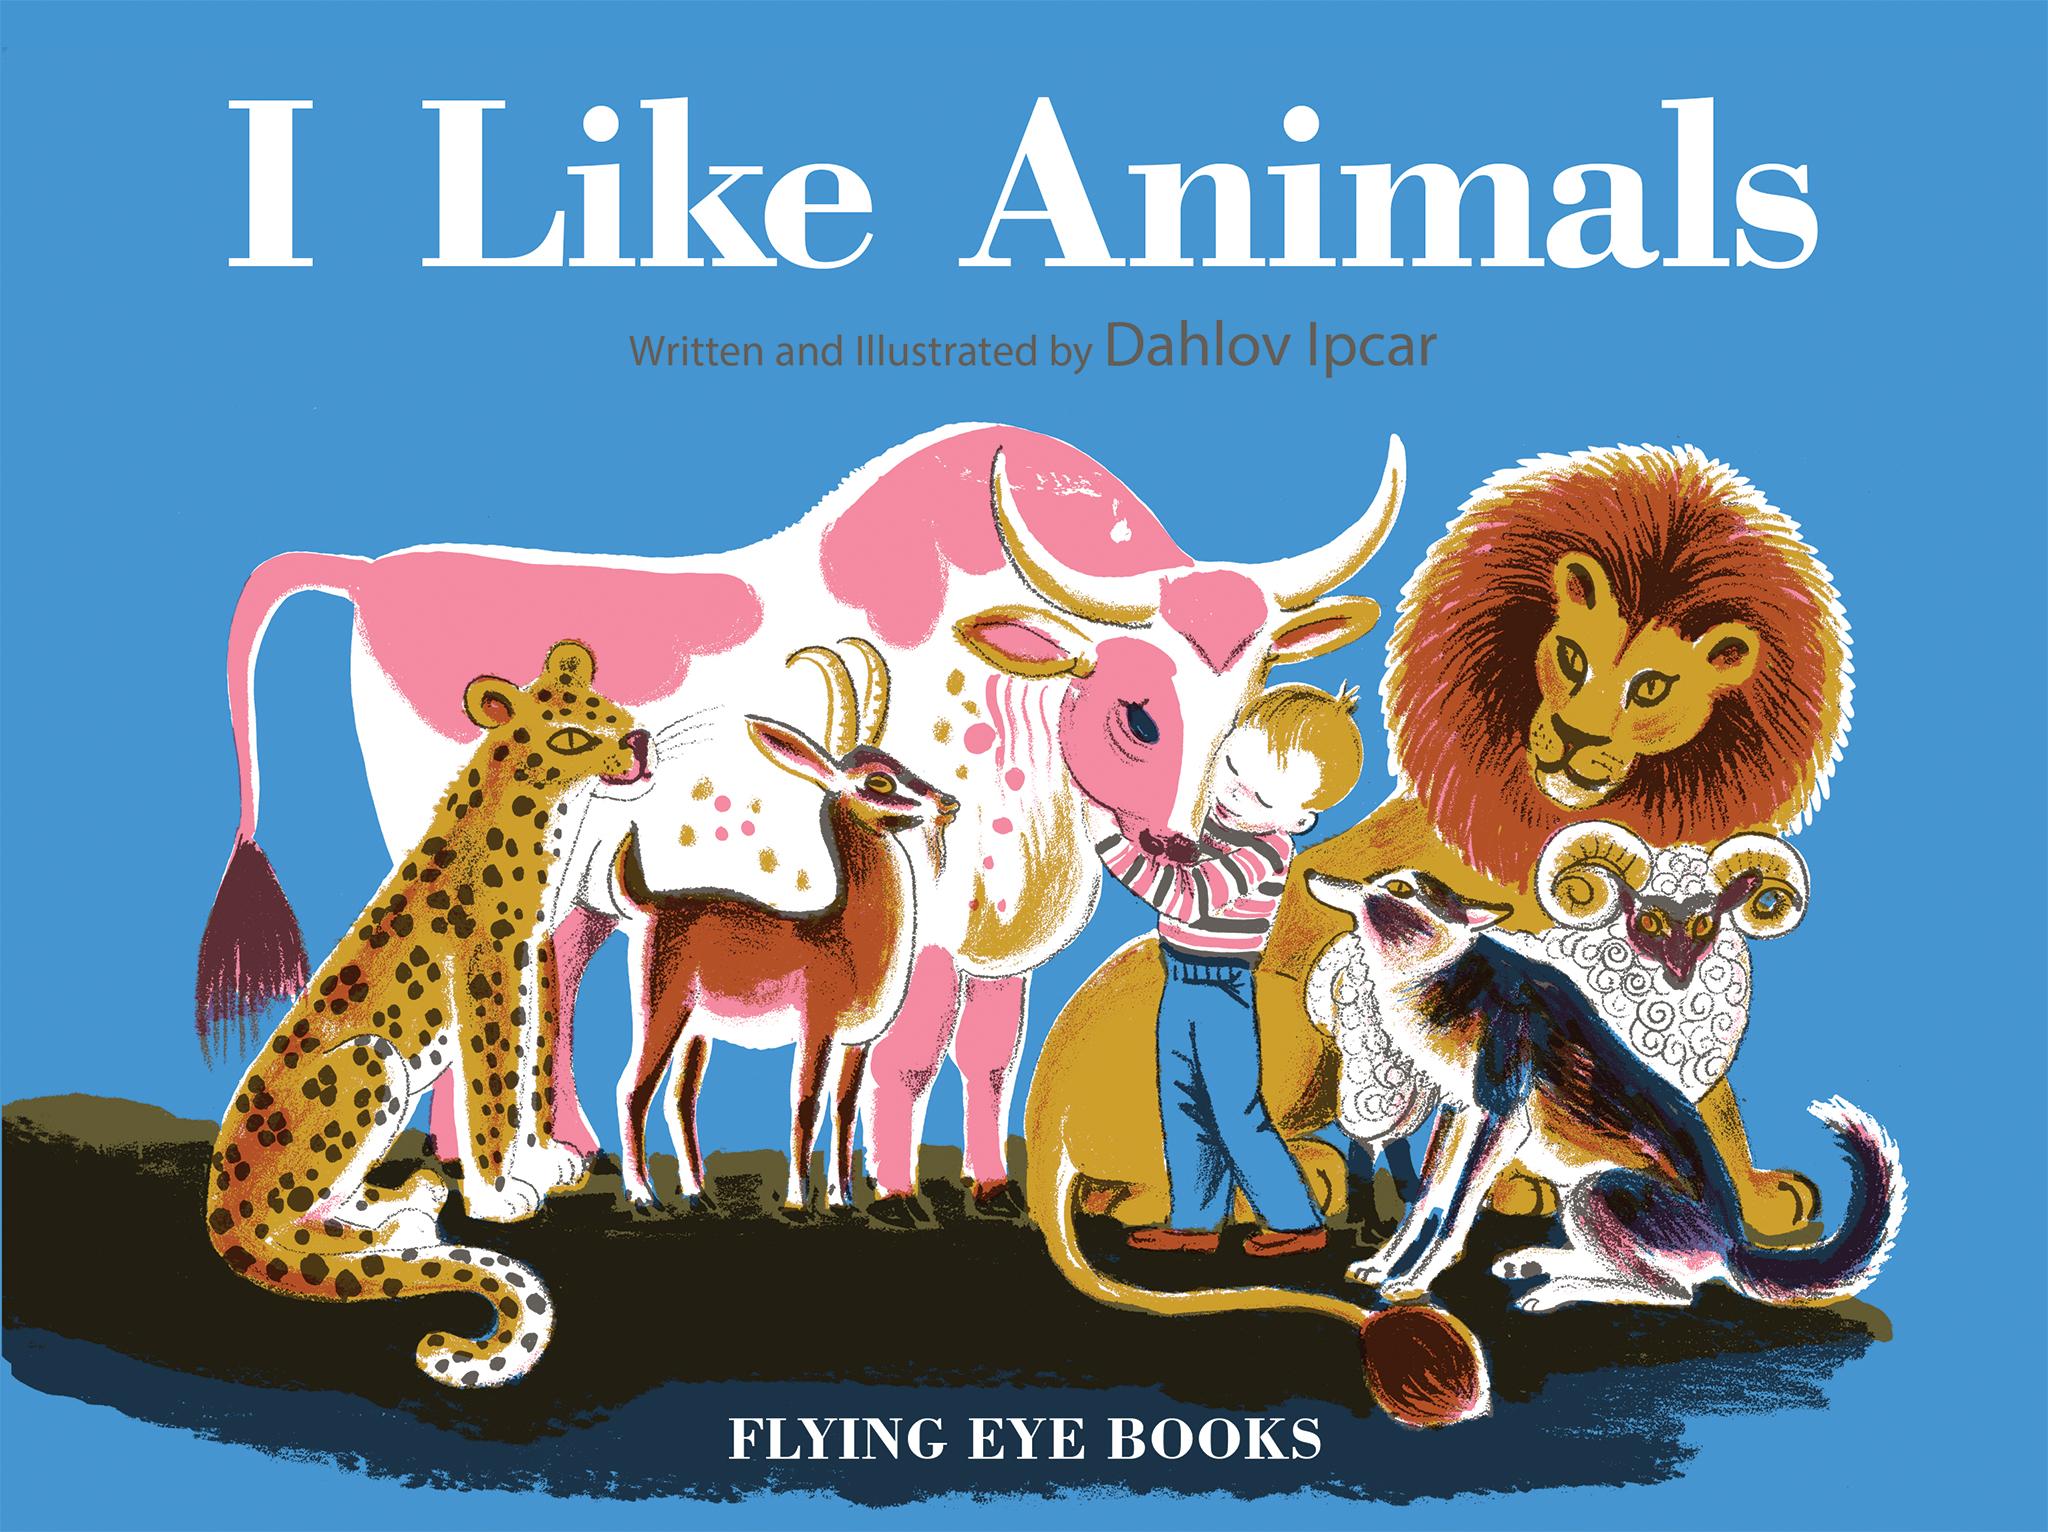 I Like Animals